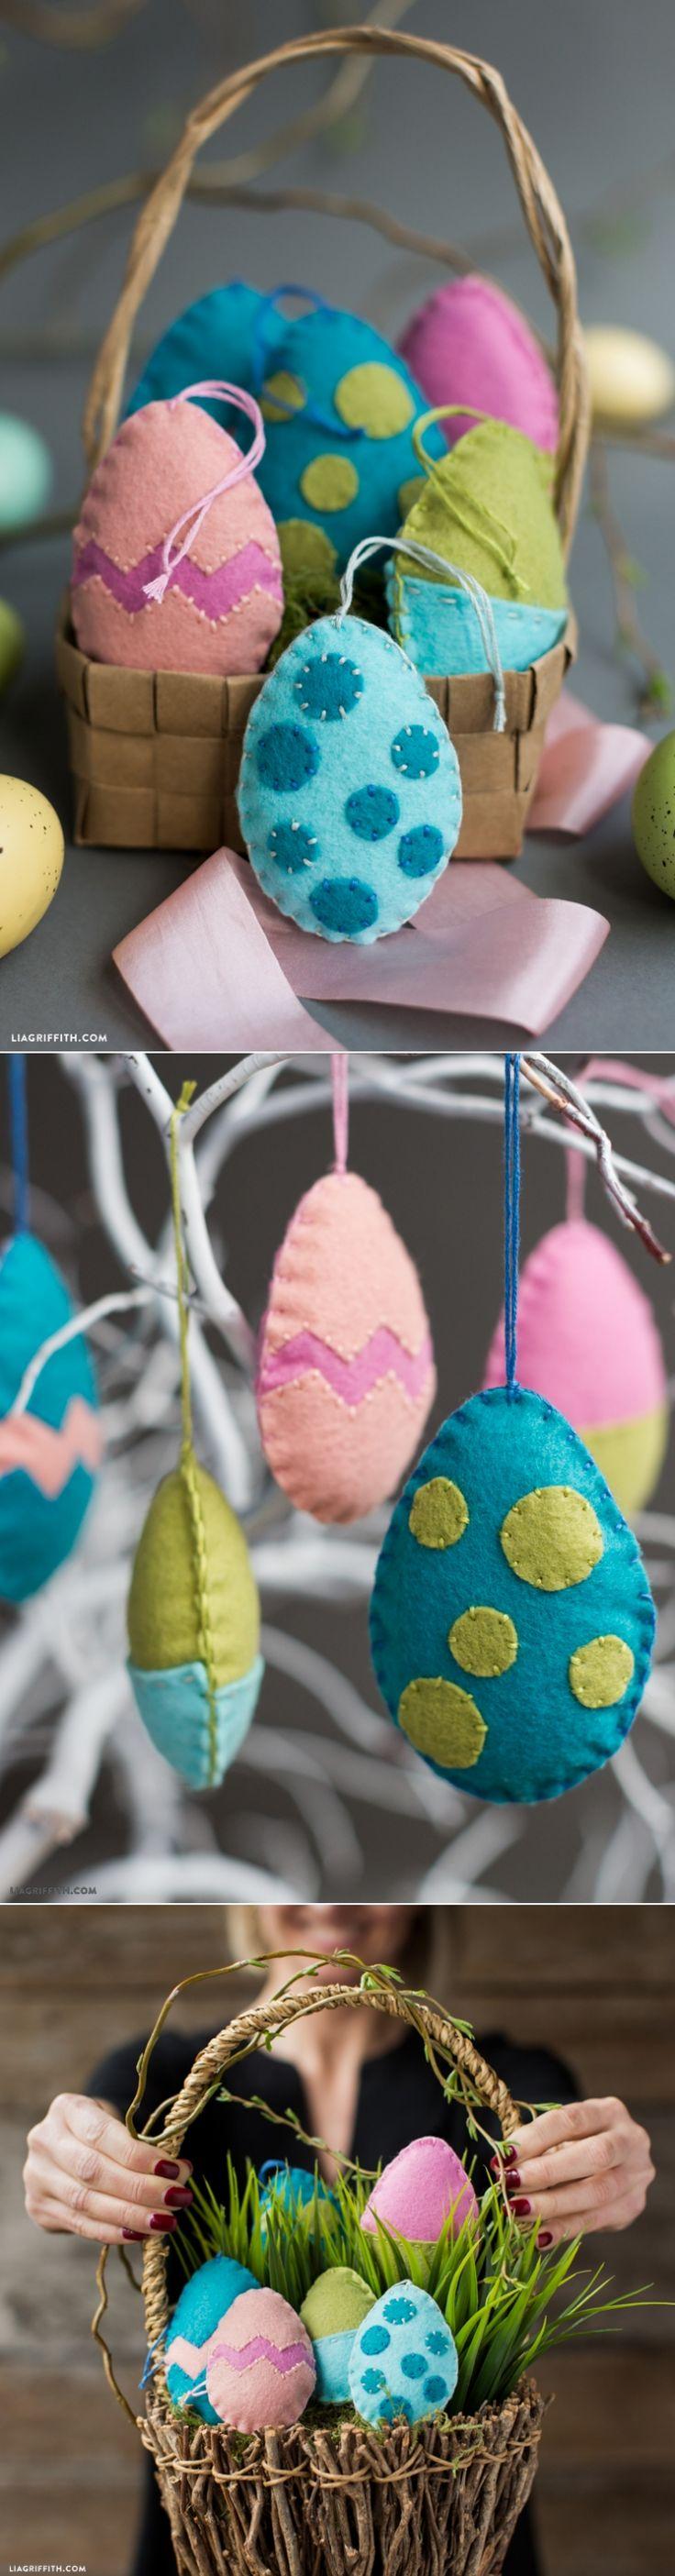 #feltcraft #Eastereggs #felteggs #Easterdecorations www.LiaGriffith.com: